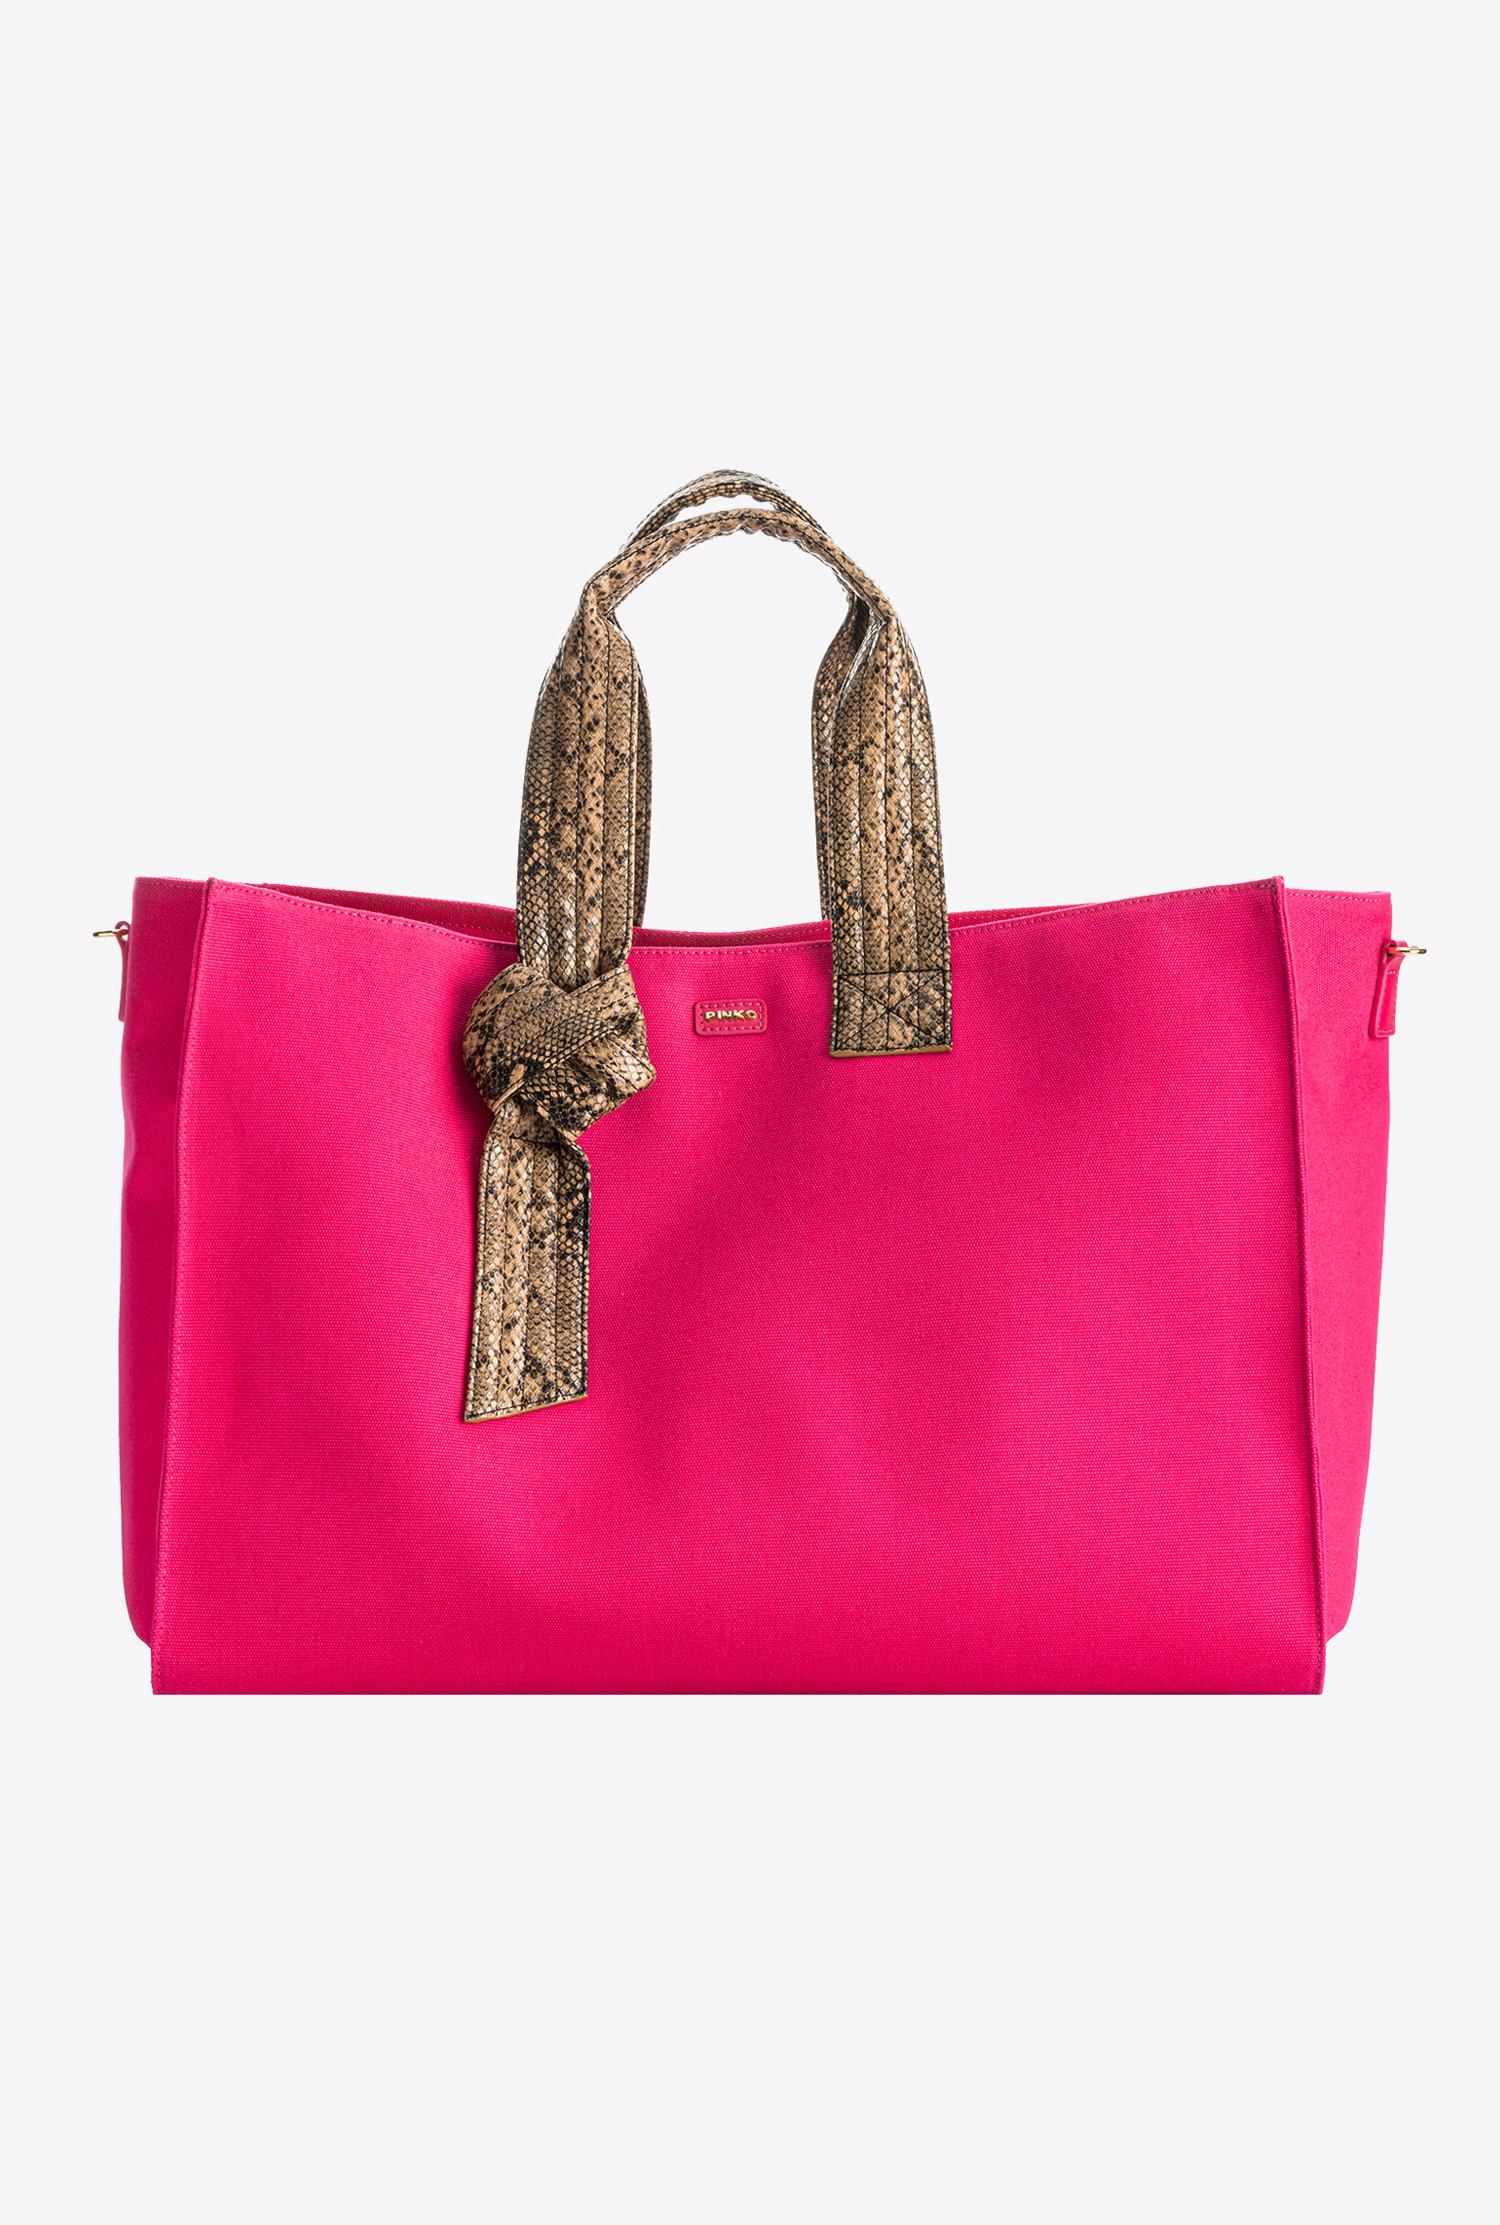 Canvas Shopping Bag Beach Bag Handbag Funky Vegetable Red Chili  Chilli Pepper Tote Bag